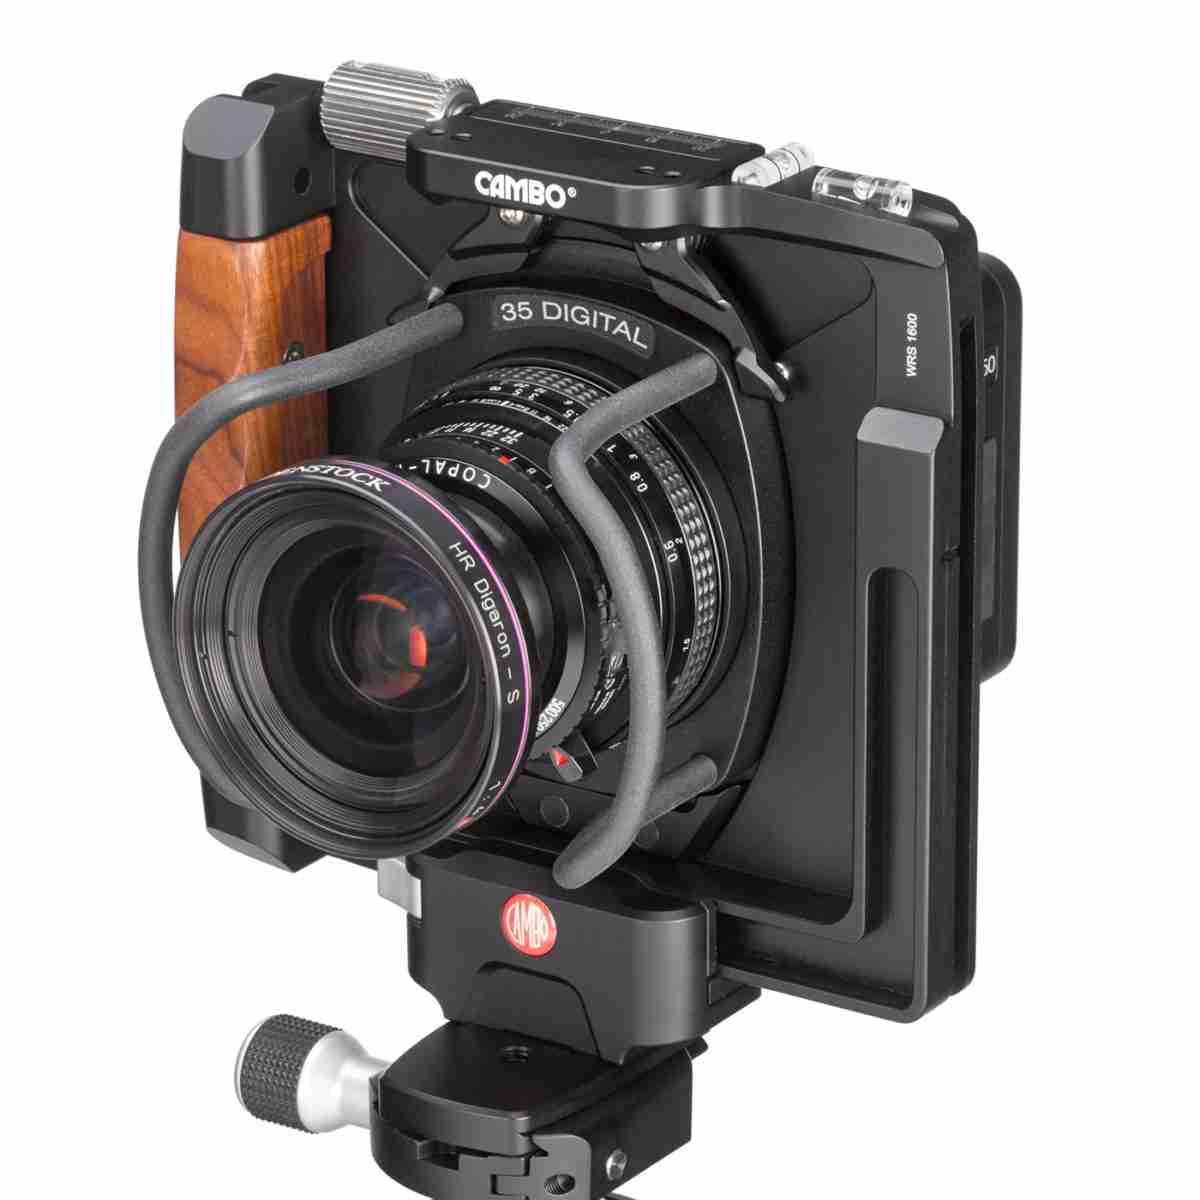 The Cambo WRS Technical Camera